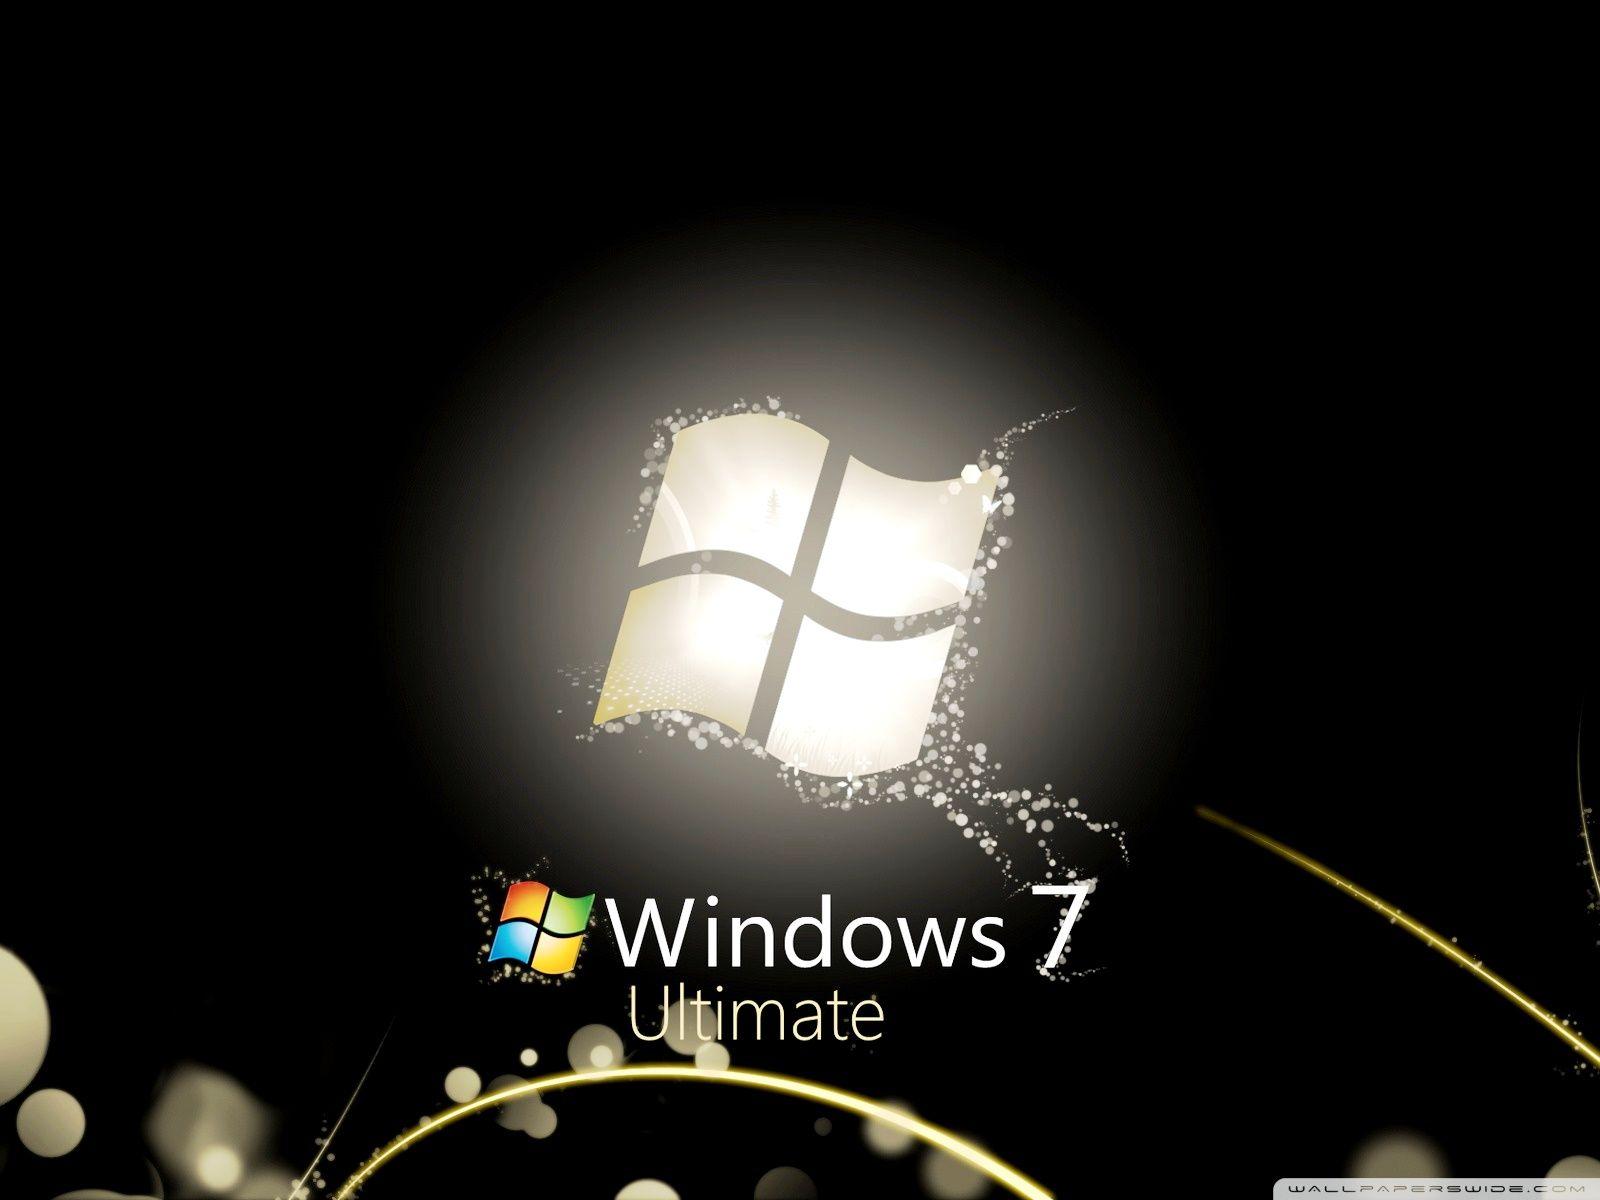 Animated Desktop Wallpaper Windows 7 Freeskringers Com Free Download Best Hd Wallpapers And Pictures Windows Wallpaper Windows Wallpaper